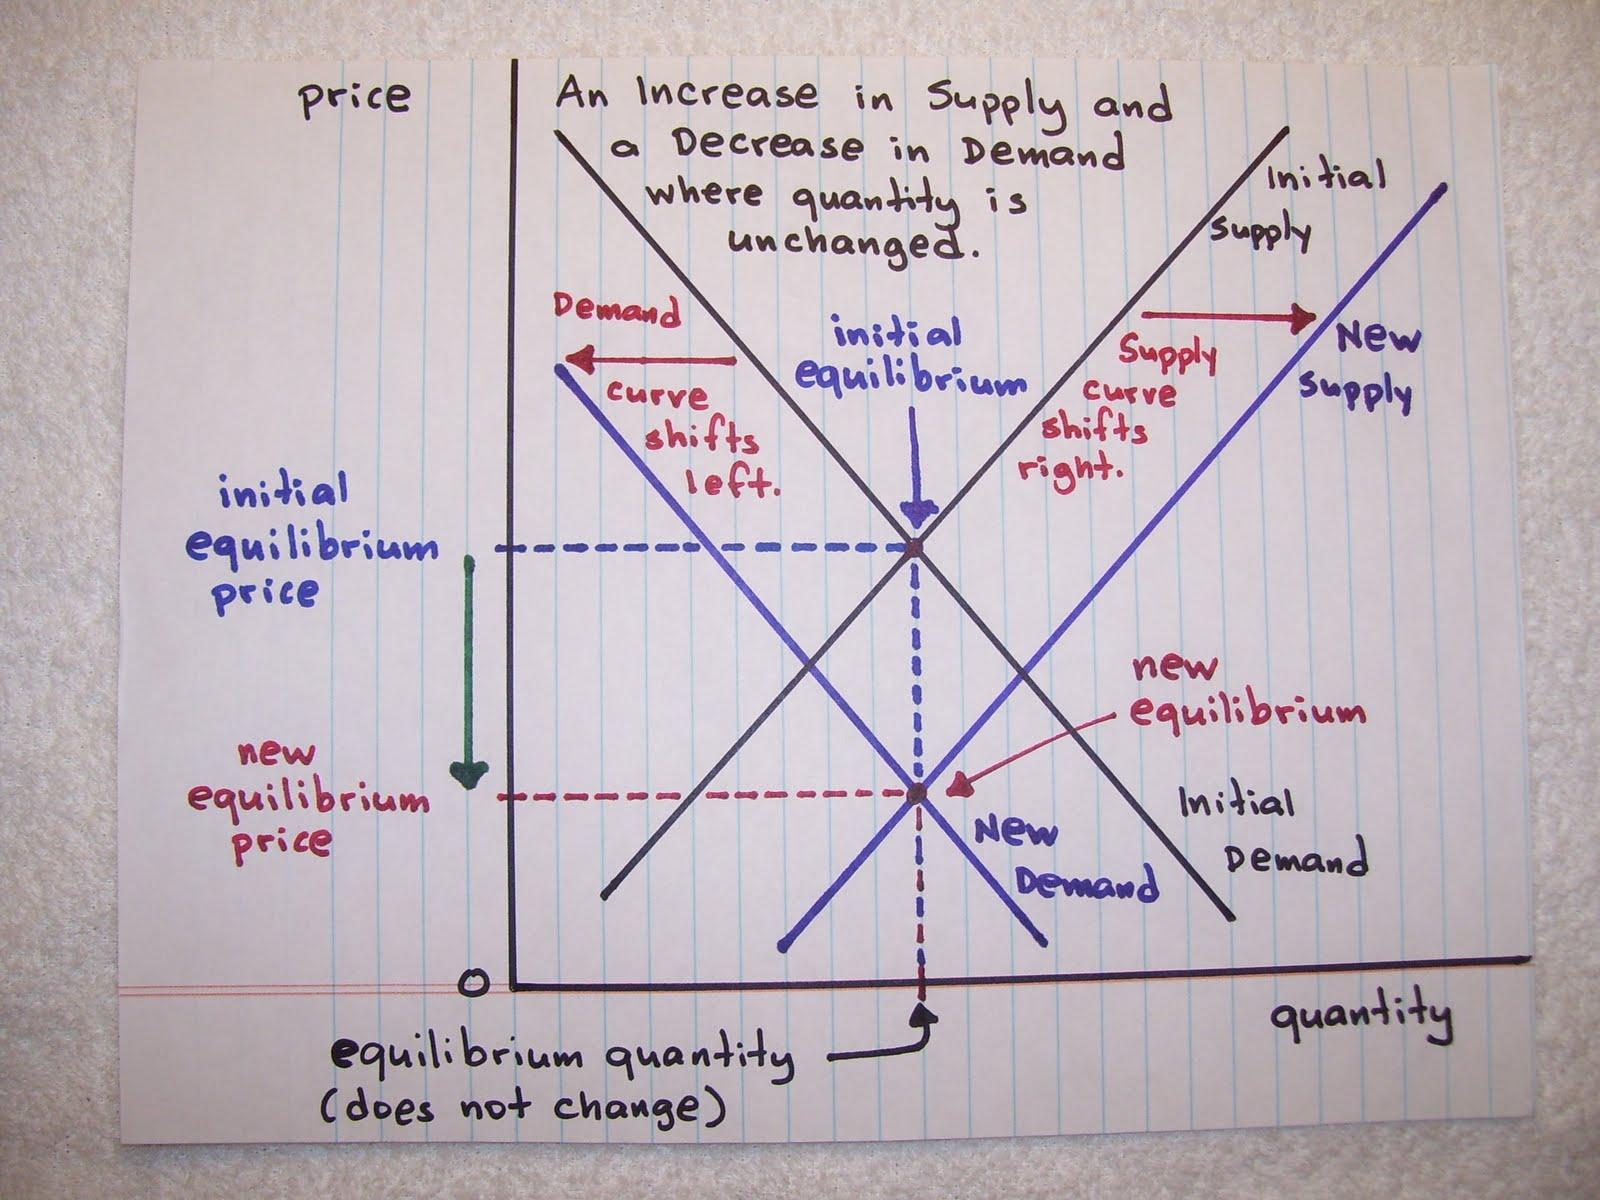 Necessary Economic Balance Changes